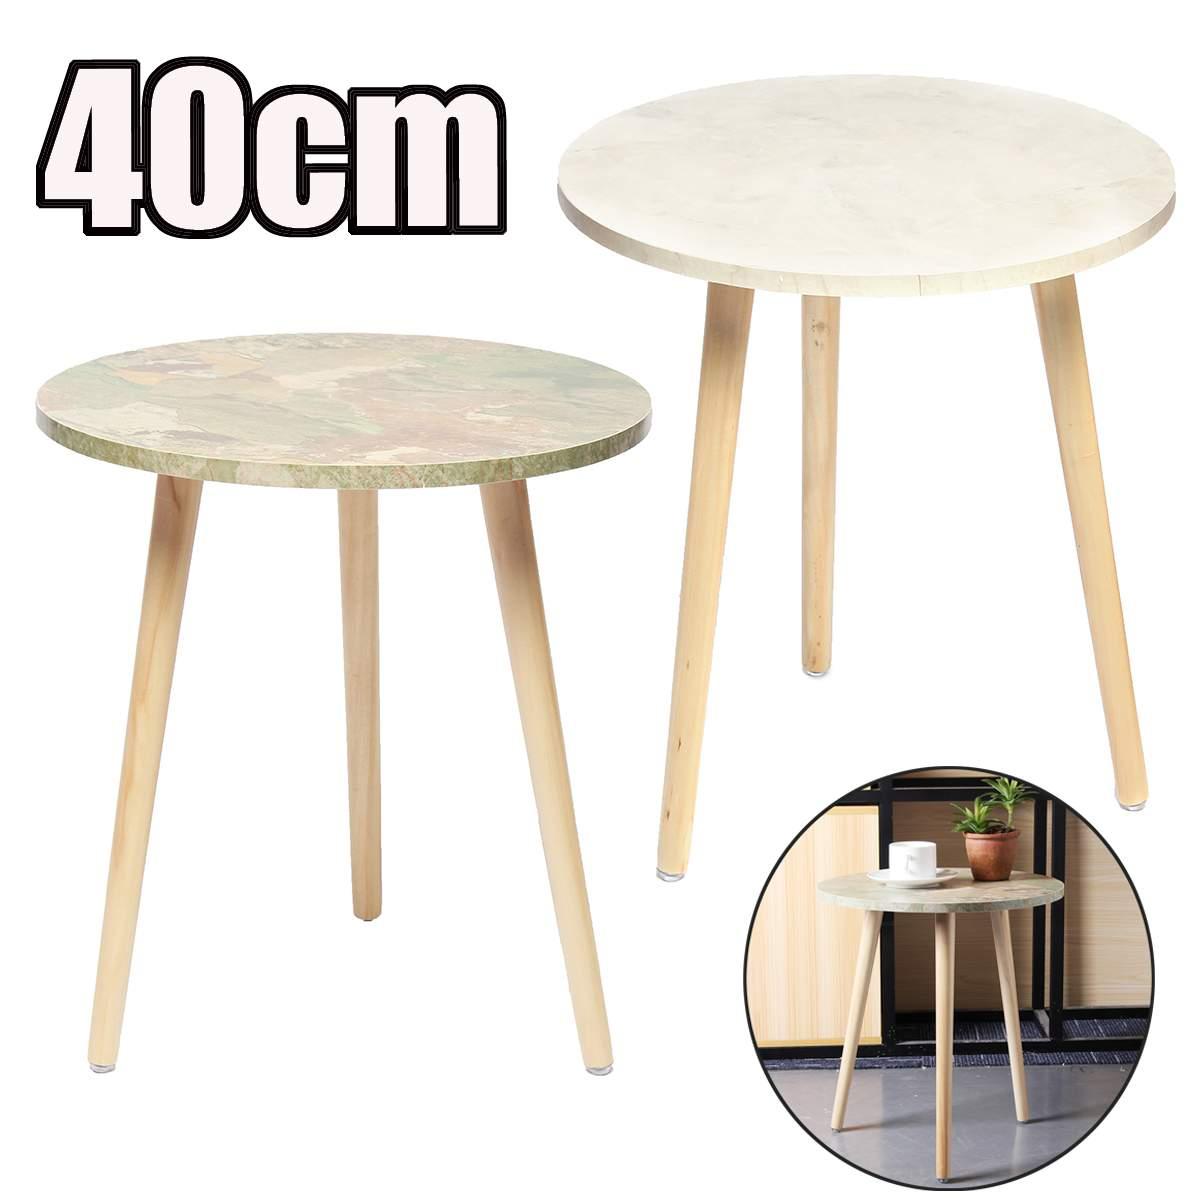 Furniture Have An Inquiring Mind Todos Tipos Table Bancos Moderno Sedia Fauteuil Stoelen Kruk Stuhl Ikayaa Tabouret De Moderne Stool Modern Cadeira Bar Chair 100% Original